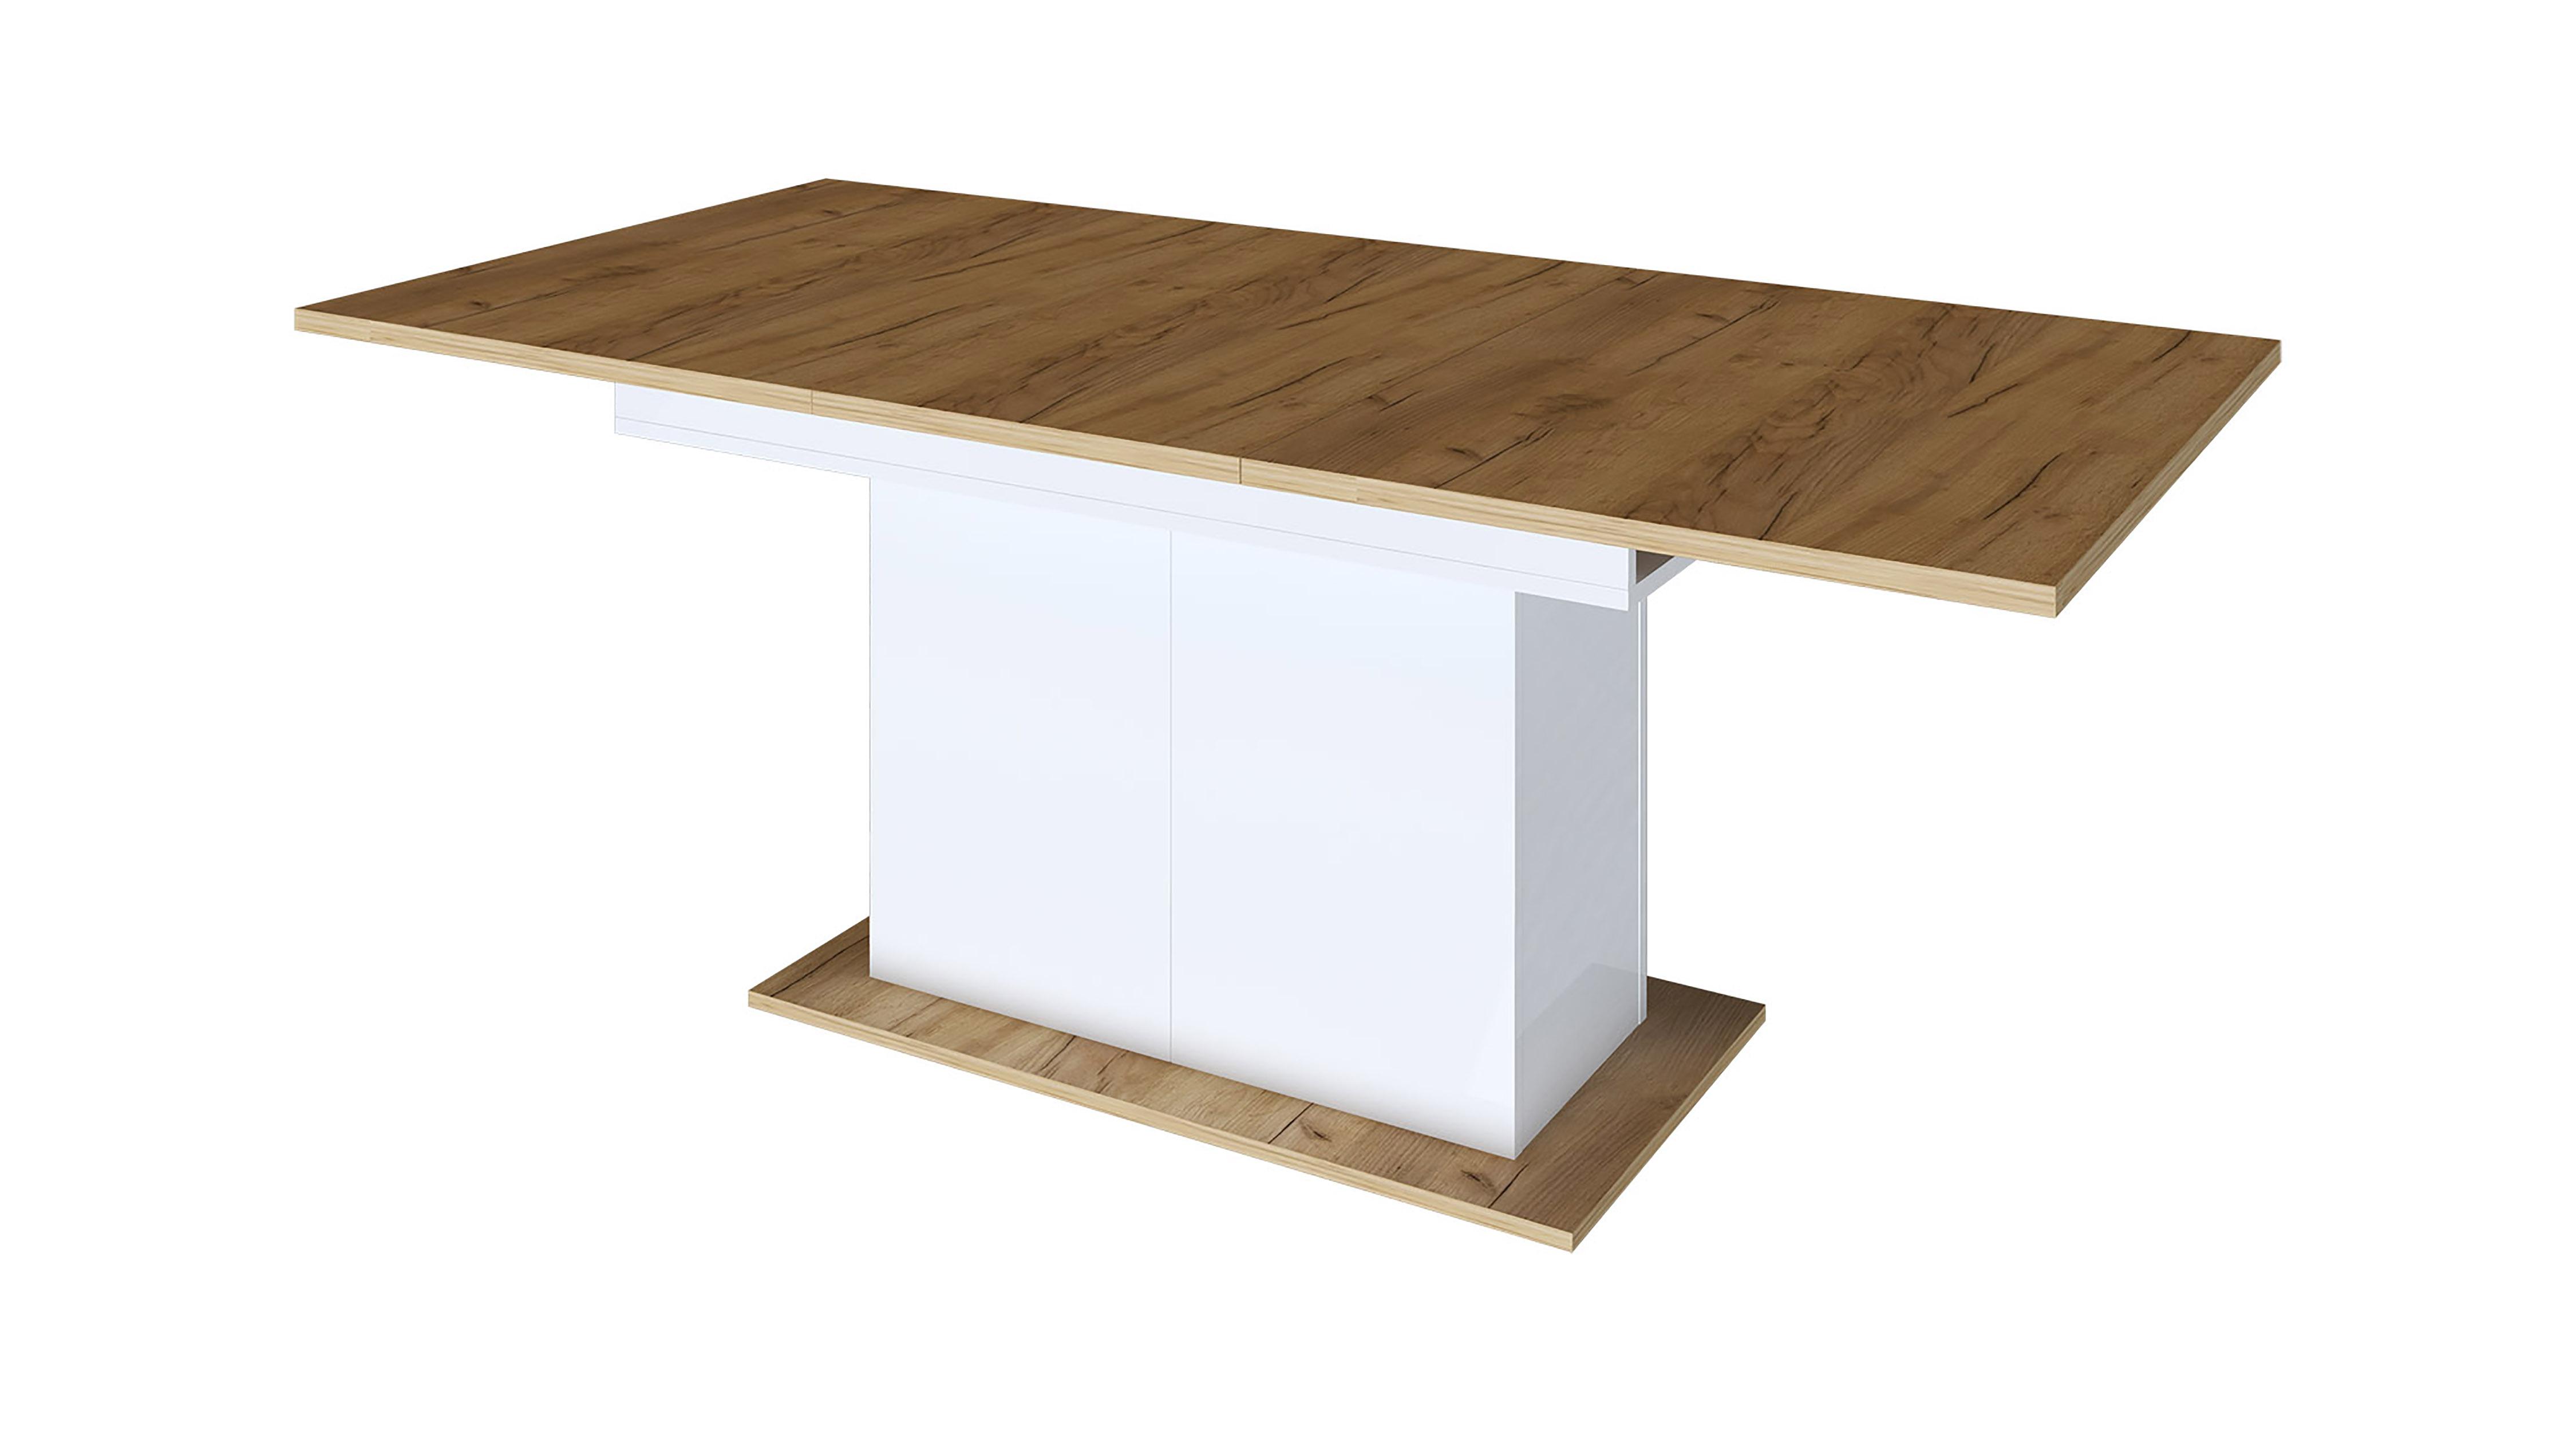 Стол обеденный раздвижной на опоре Дуб крафт - фото